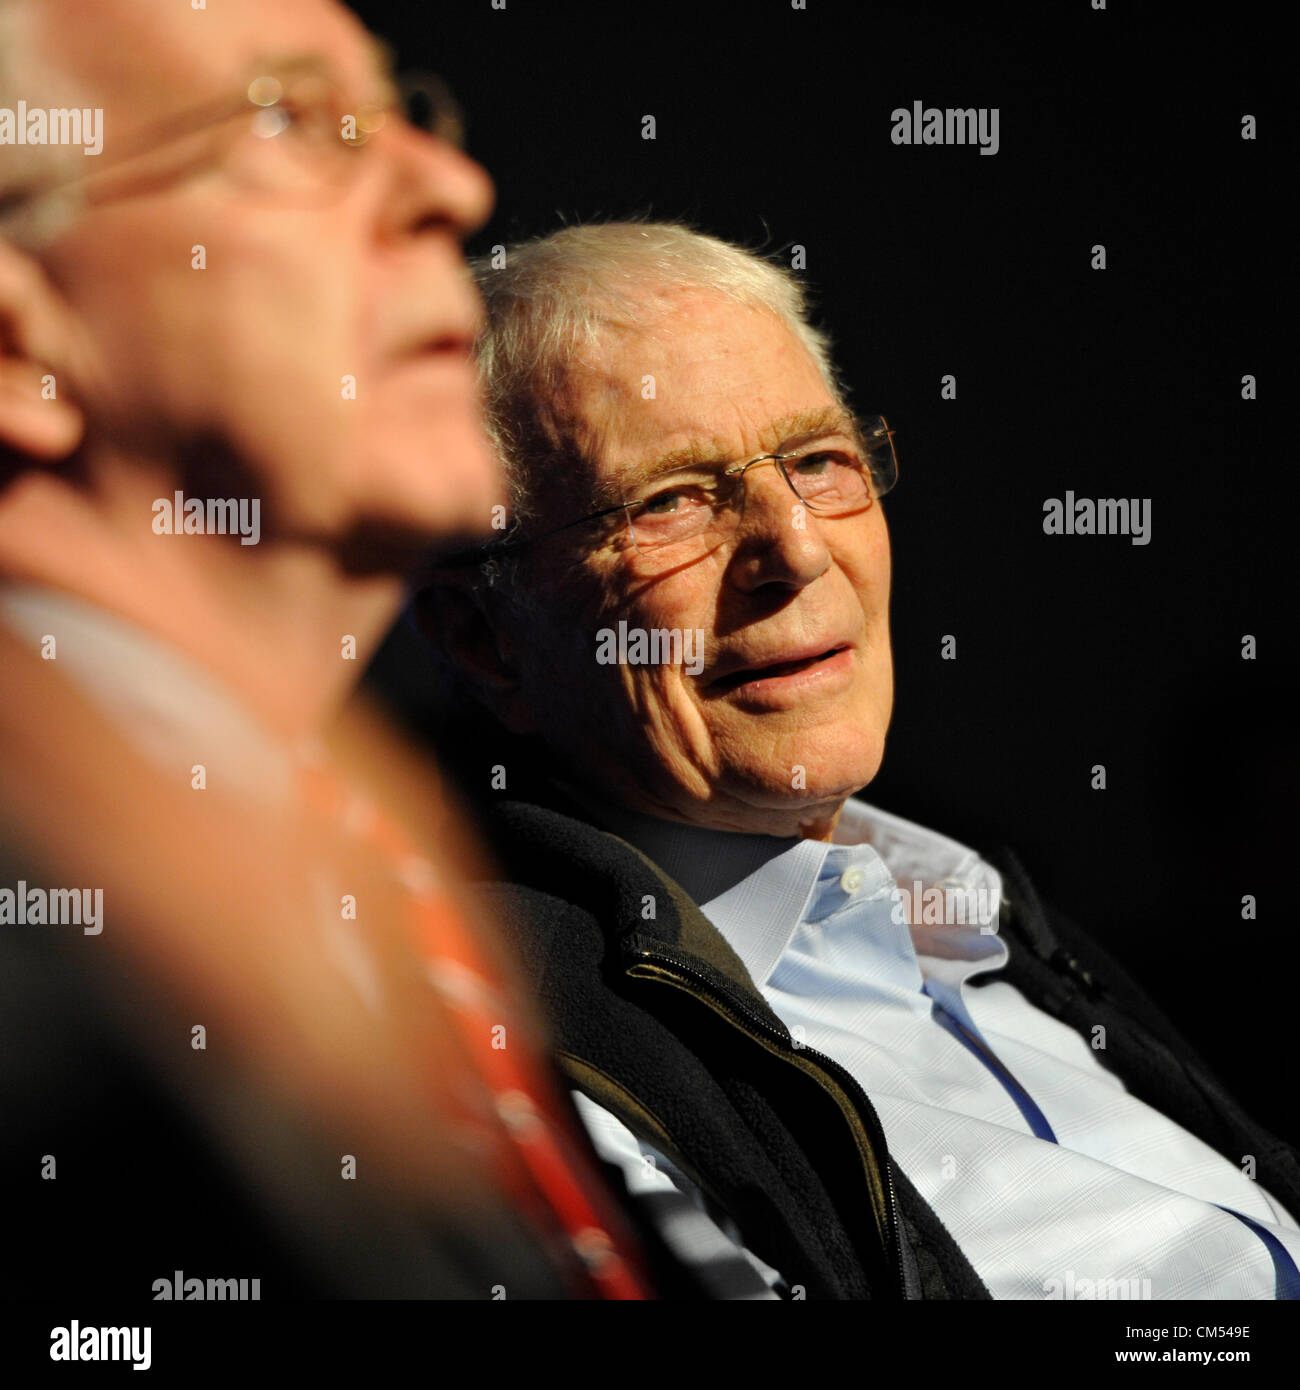 Oct 4, 2012 - GARDEN CITY, NEW YORK U.S. - (L - R) NY State Senator KEMP HANNON and Mercury astronaut SCOTT CARPENTER - Stock Image